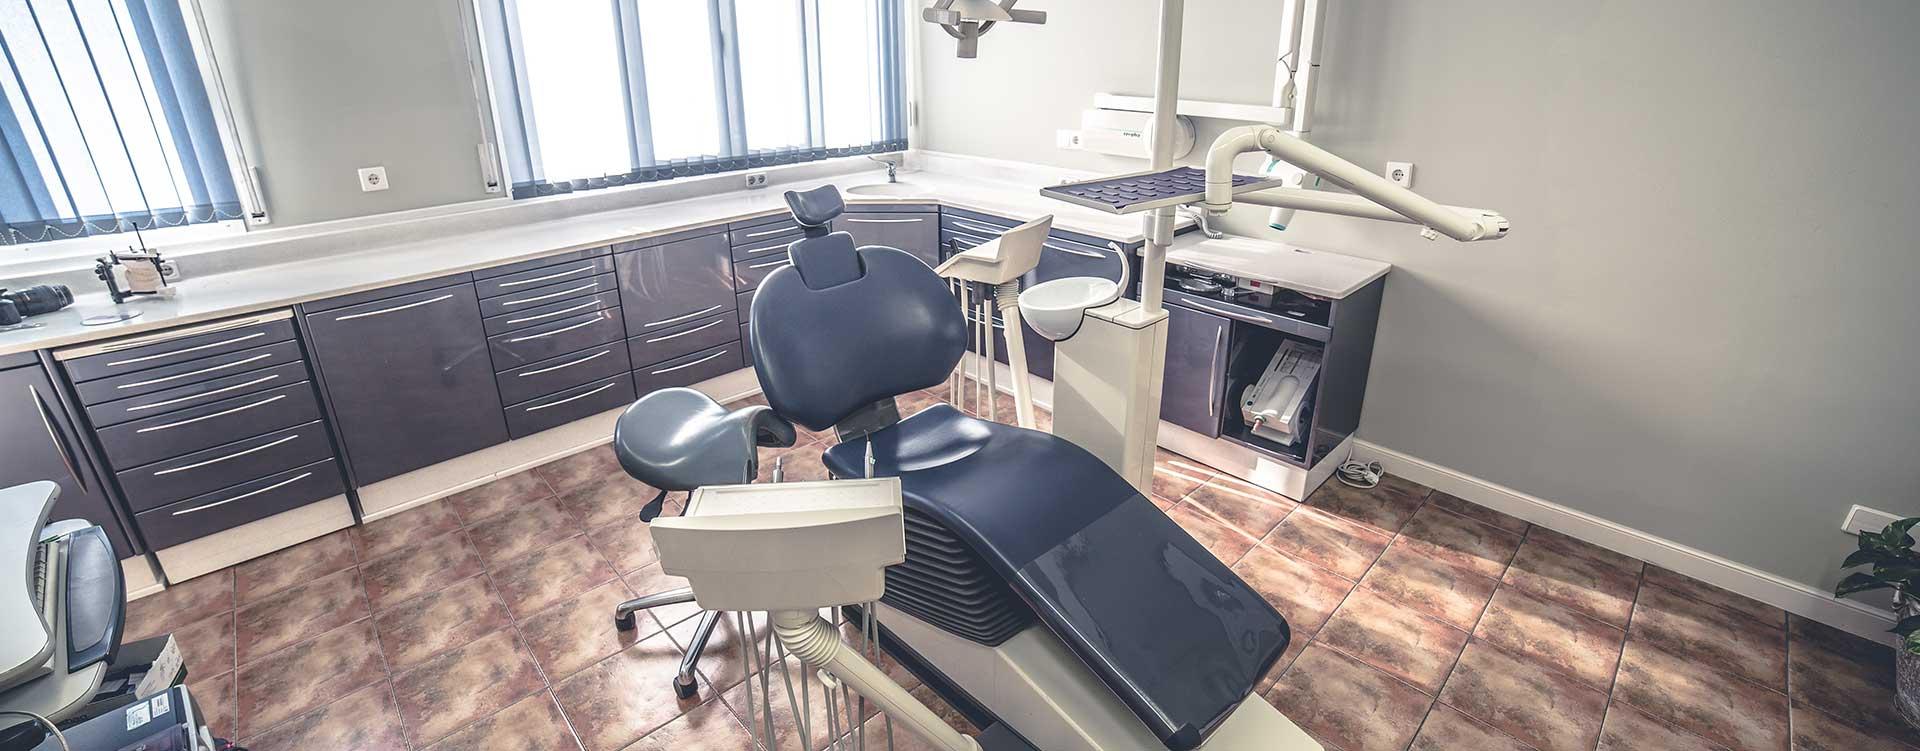 clinica-gorosabel-dental-instalaciones-8